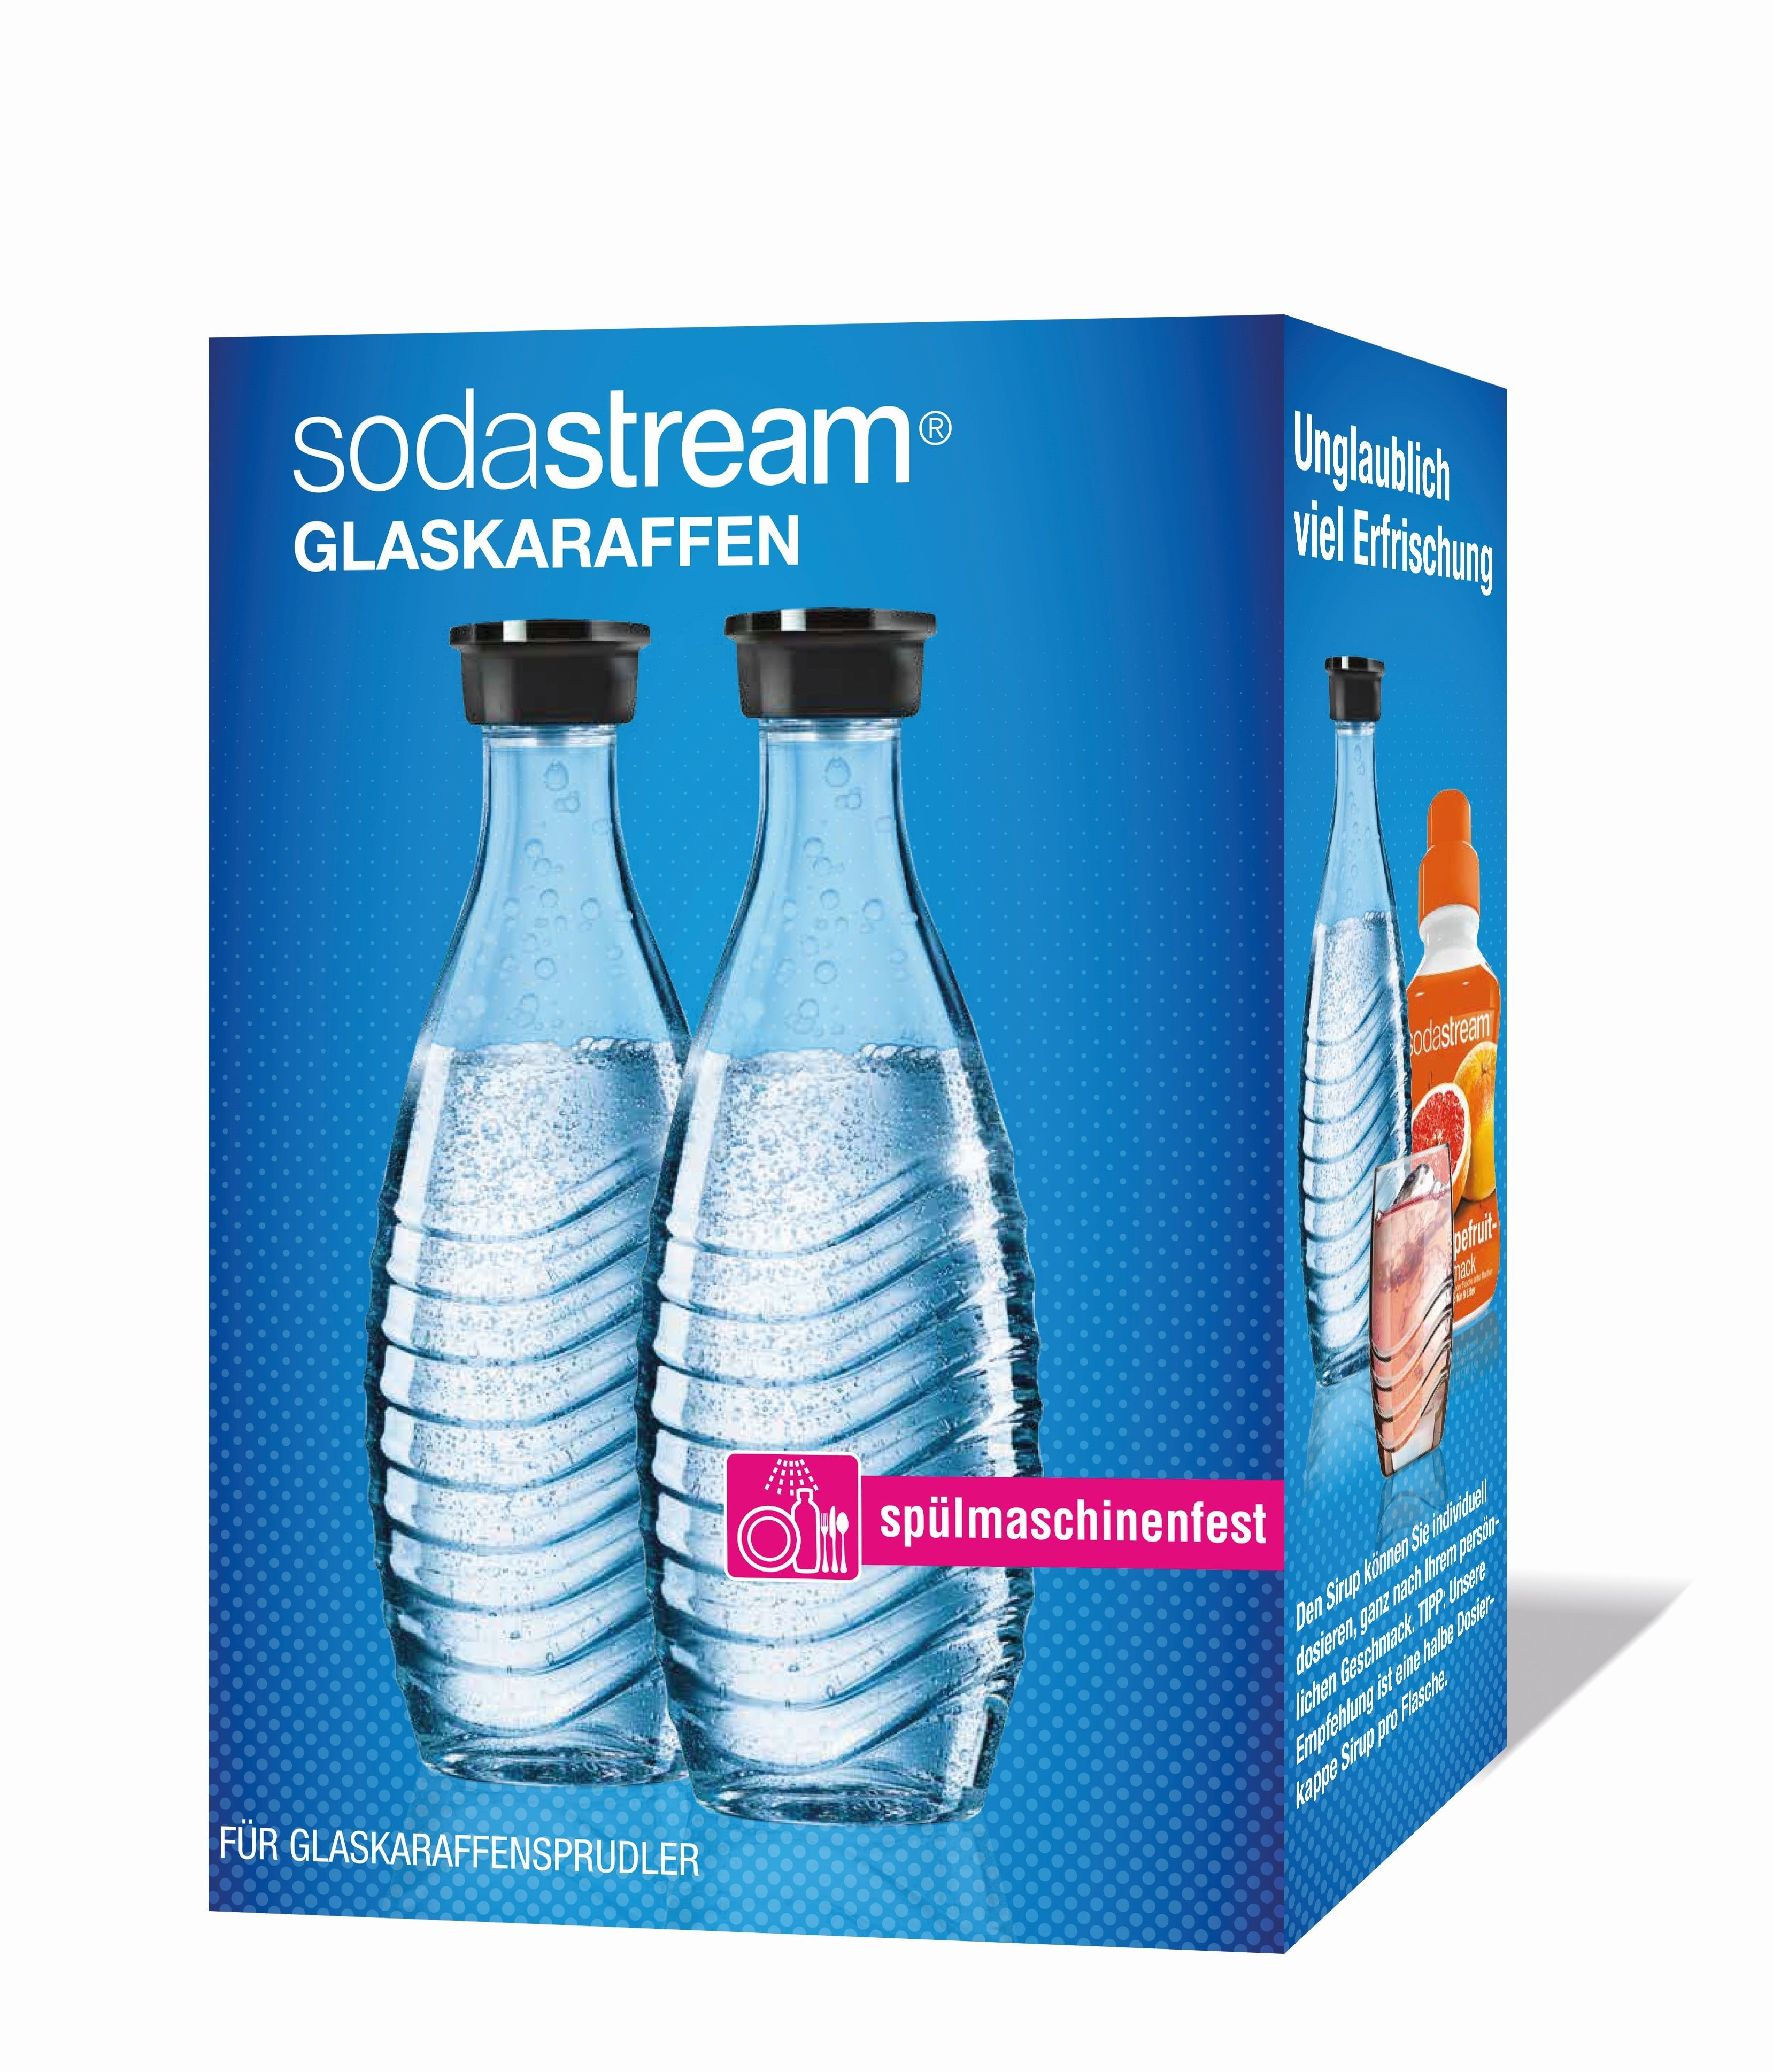 Sodastream waterkan Glazen karaf Duopack 1ltr